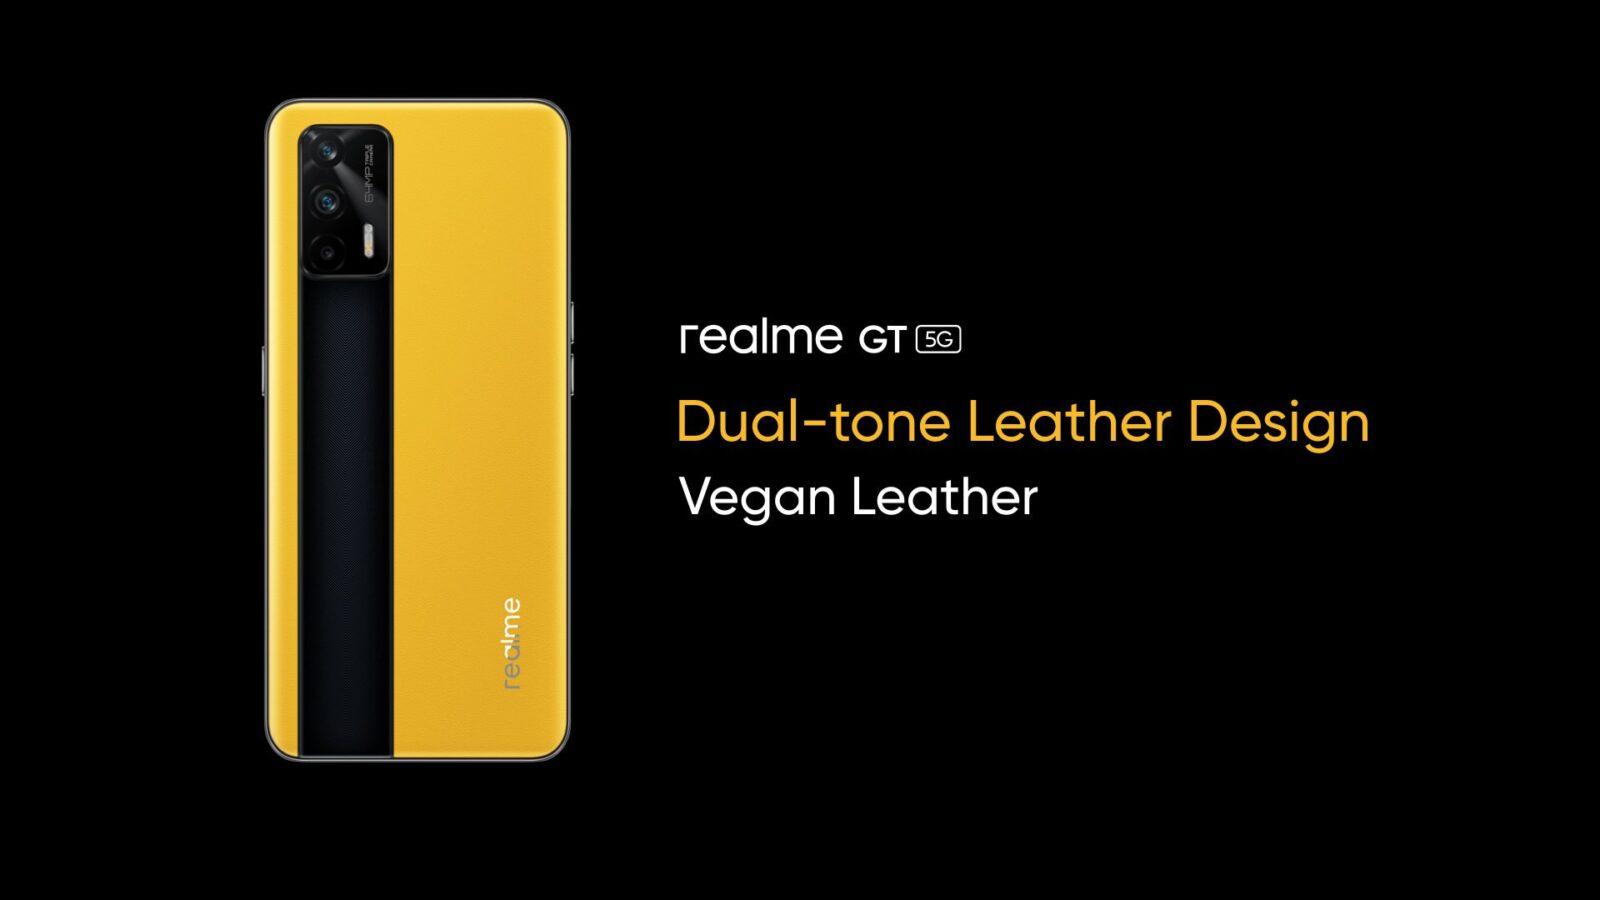 realme-gt-5g-smartphone